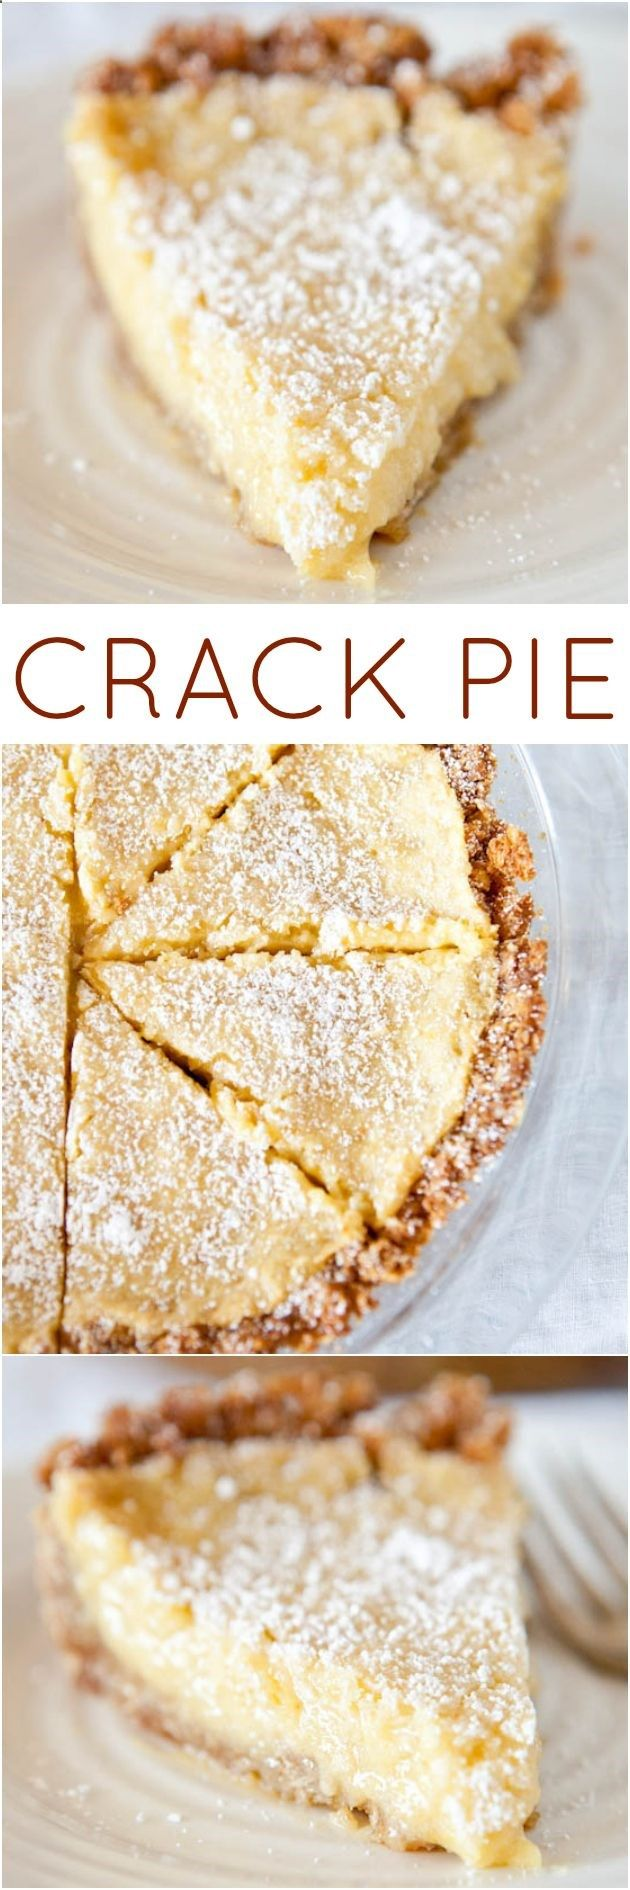 Crack Pie from the Momofoku Milkbar cookbook